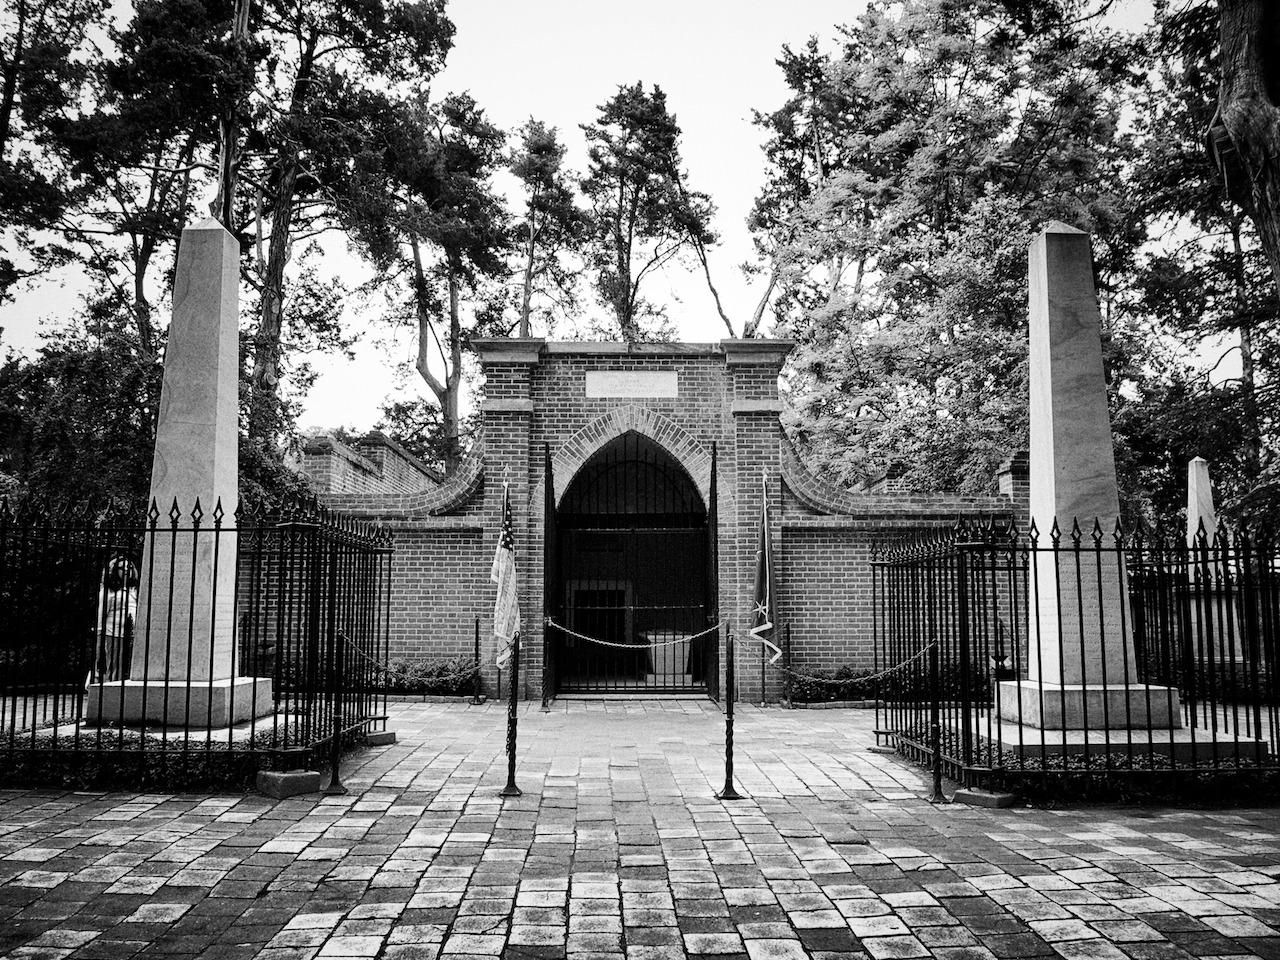 George Washington's tomb at Mount Vernon. May 1st, 2012.